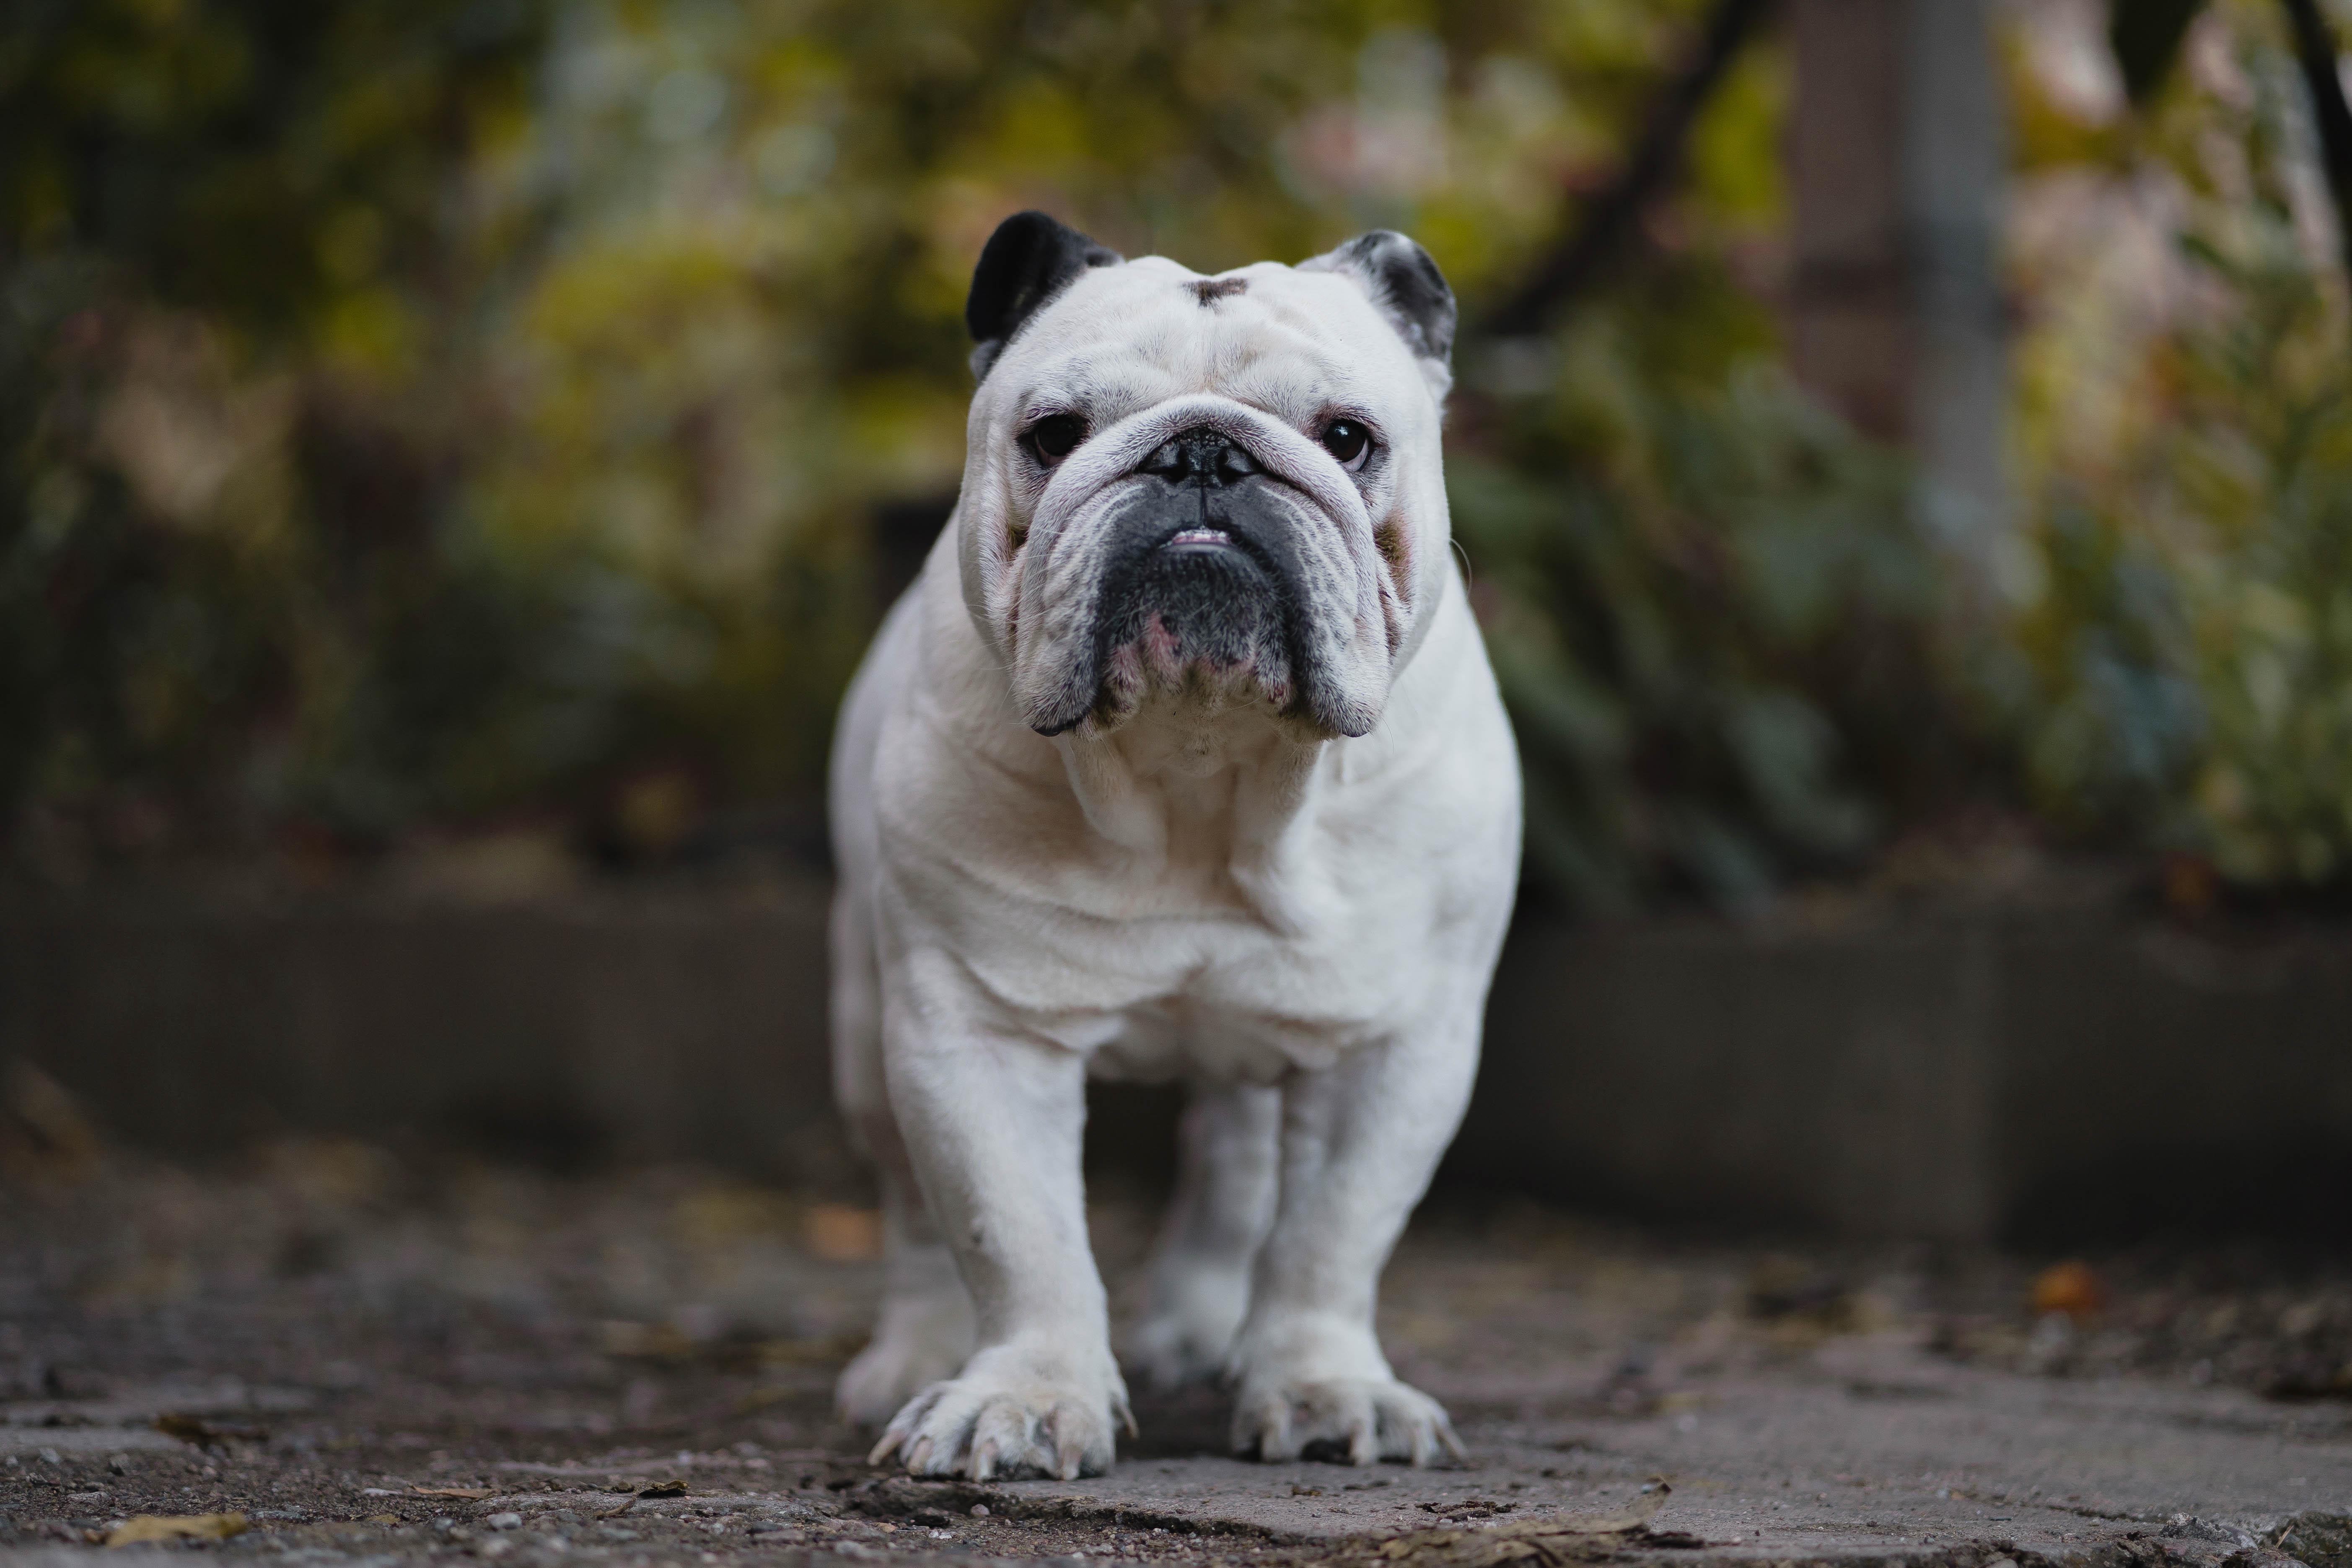 149339 download wallpaper Animals, English Bulldog, Bulldog, Dog, Serious screensavers and pictures for free